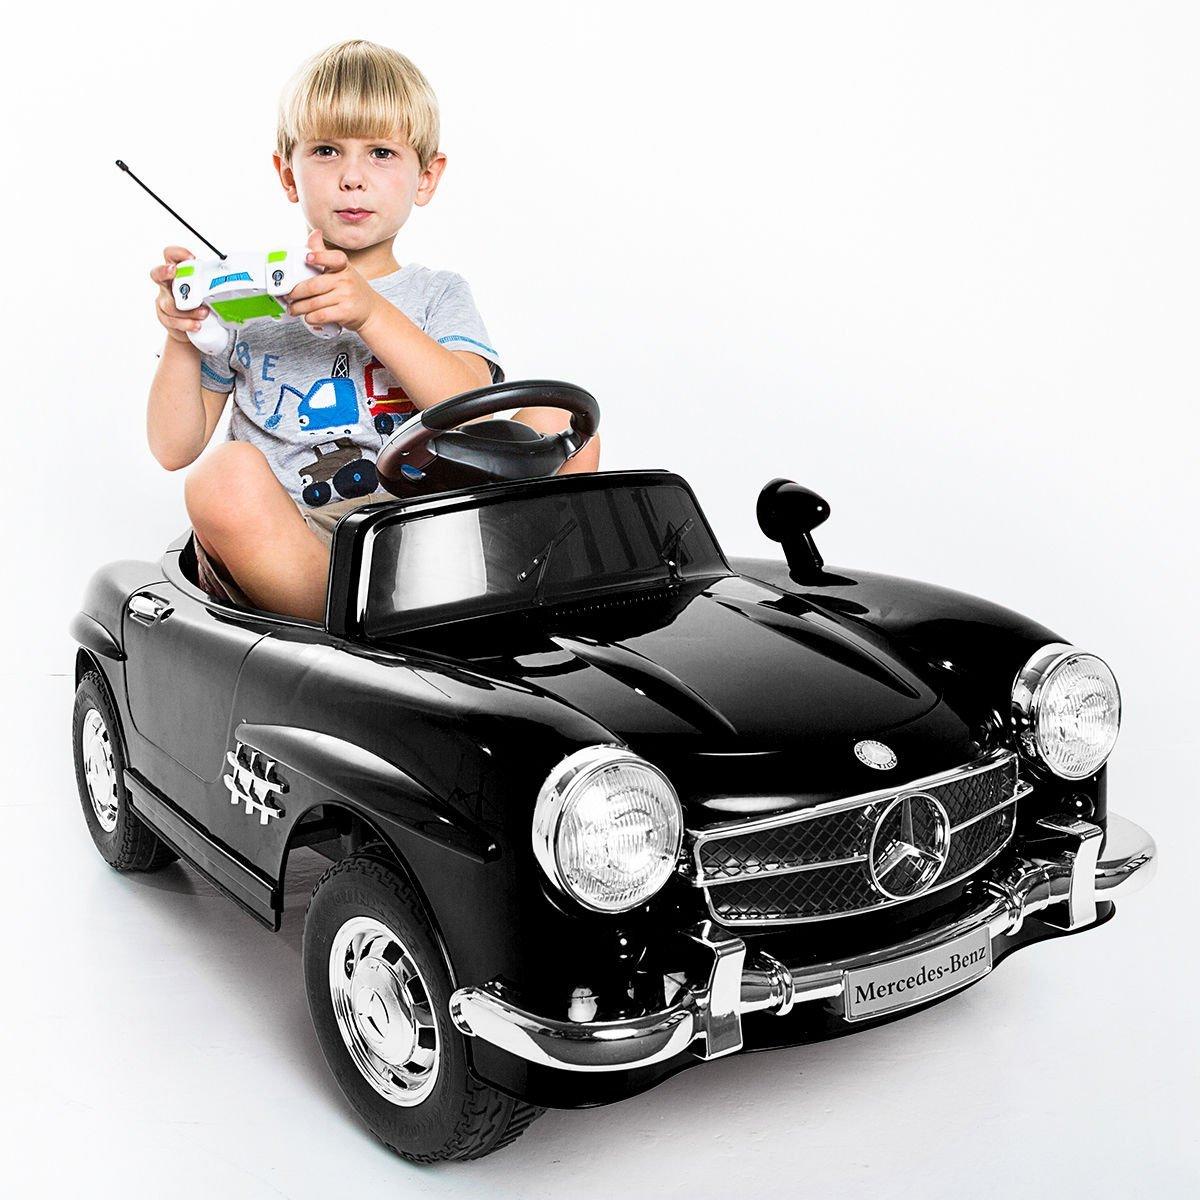 Giantex Black Mercedes Benz 300Electric Ride On Car